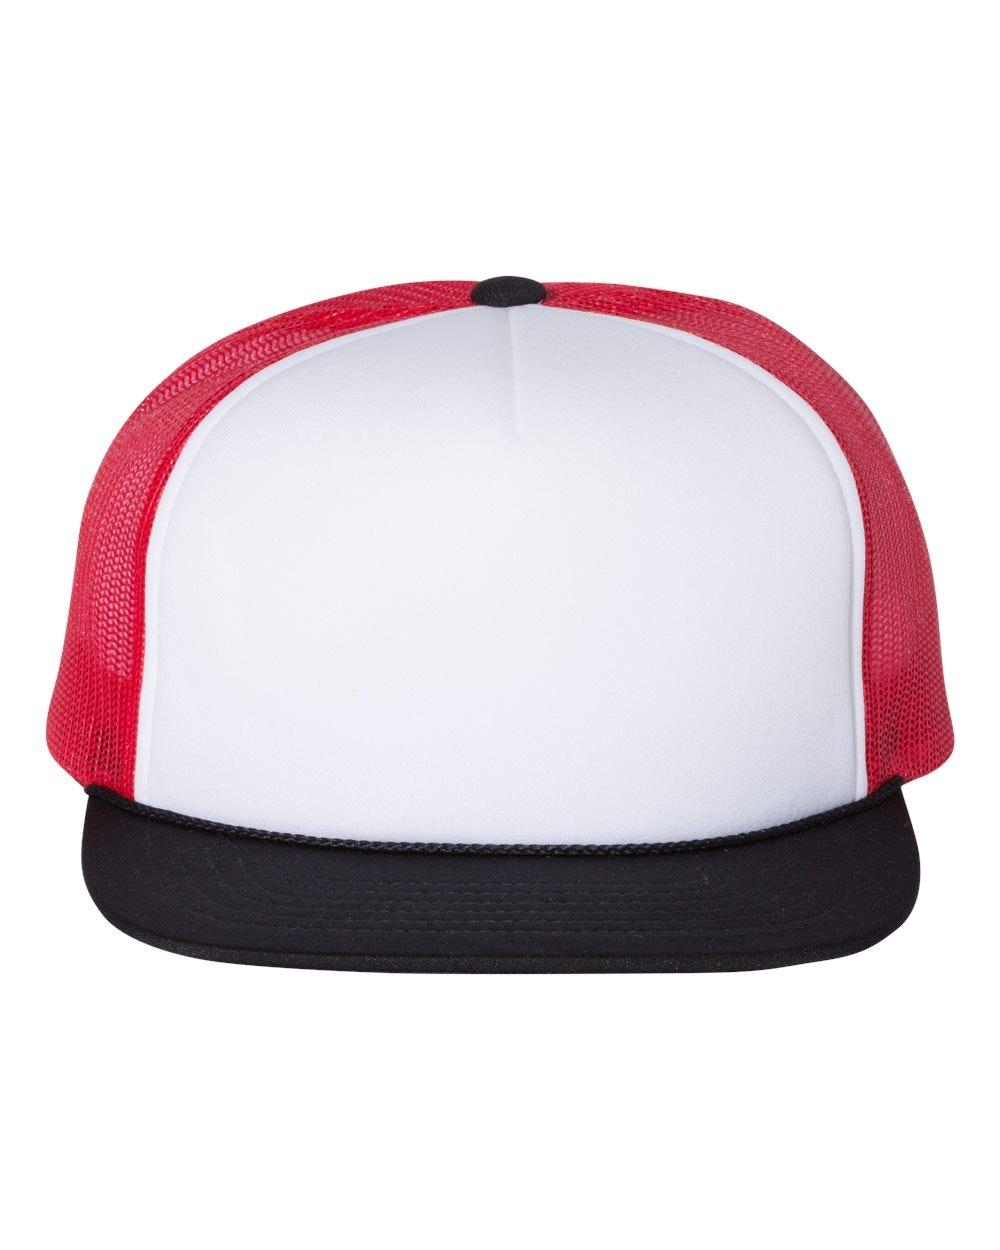 Richardson 113 White/ Red/ Black